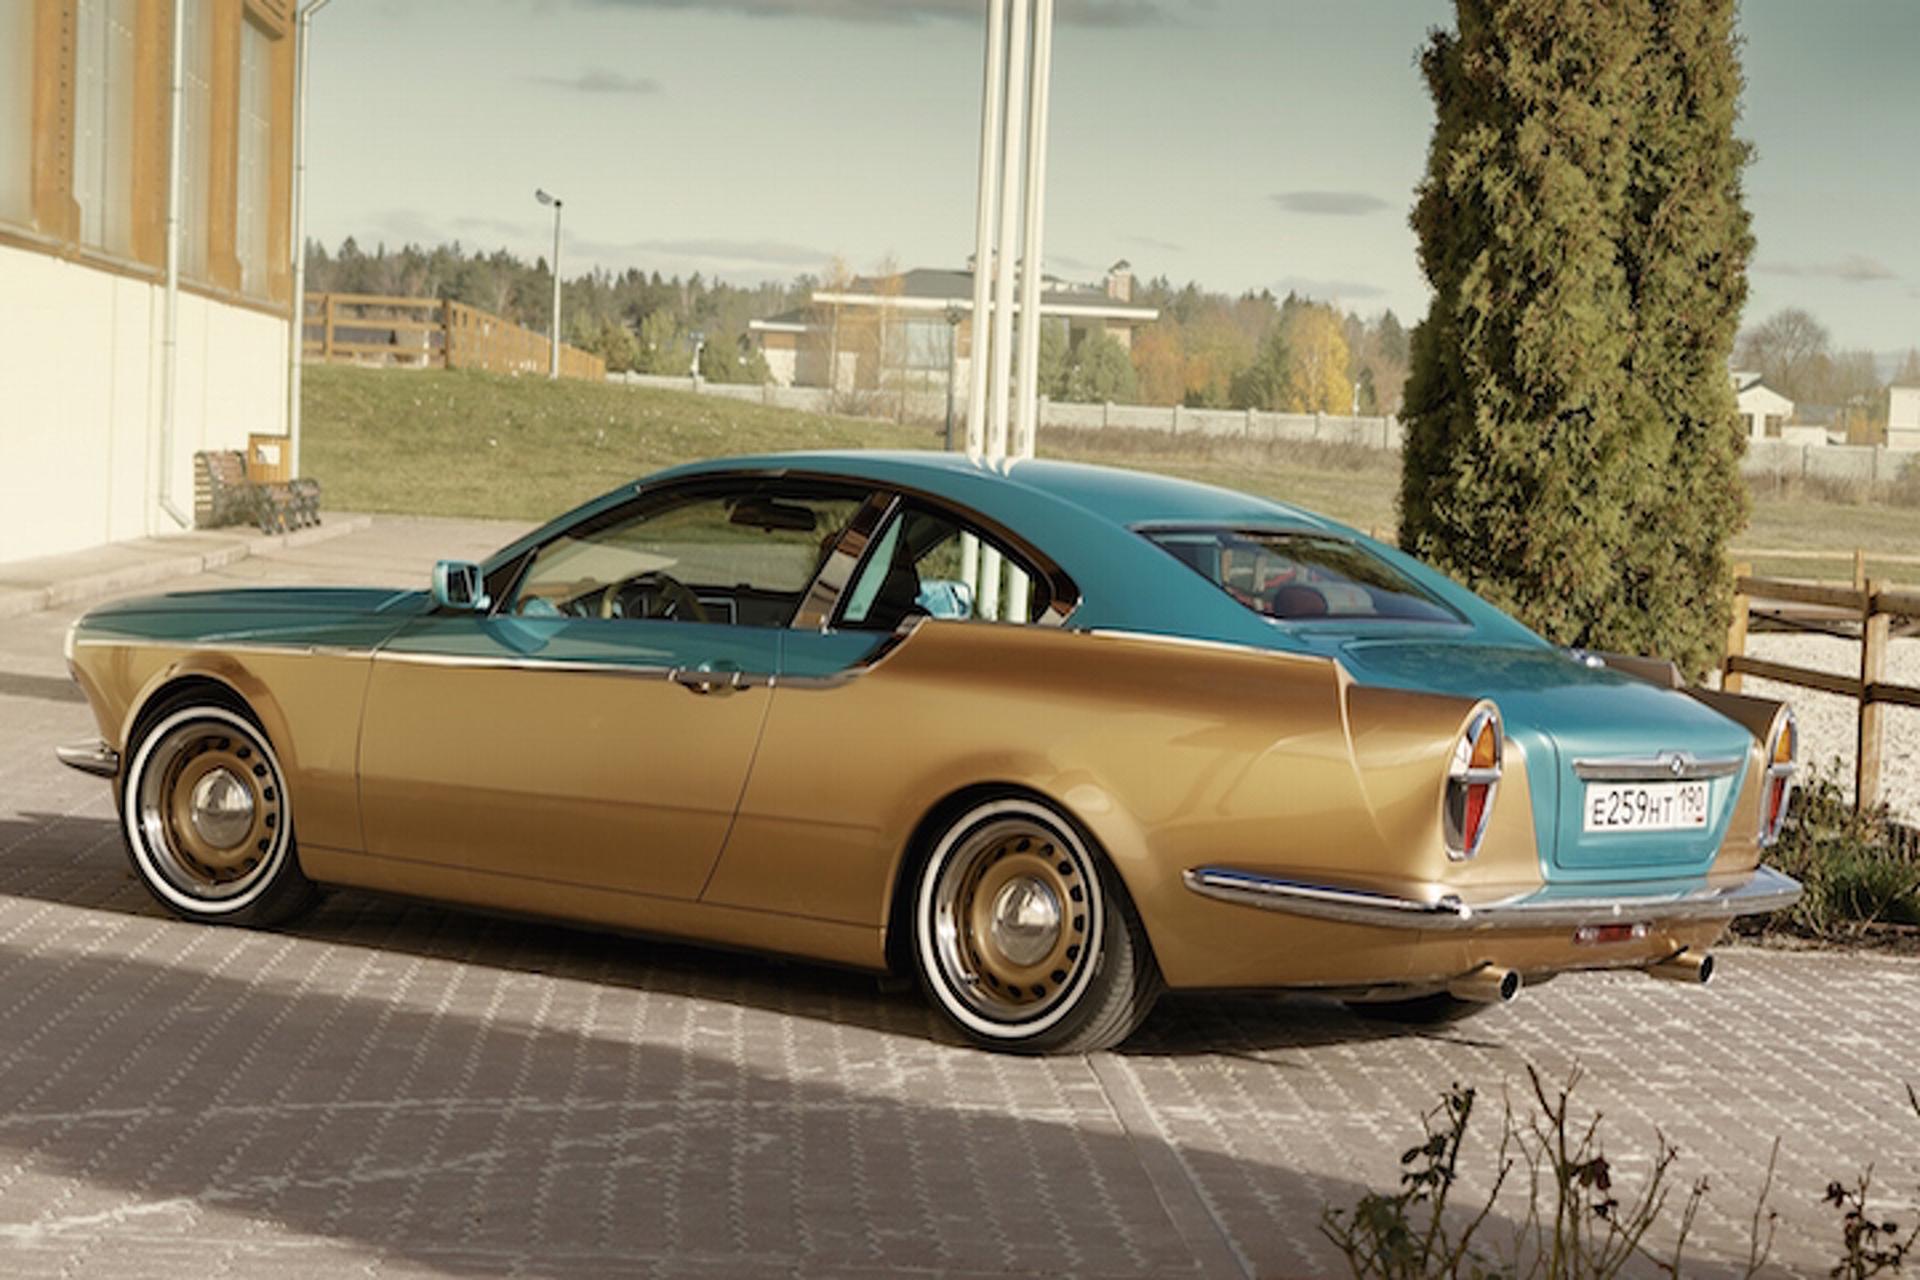 Bilenkin Vintage I 2015 - now Coupe #8